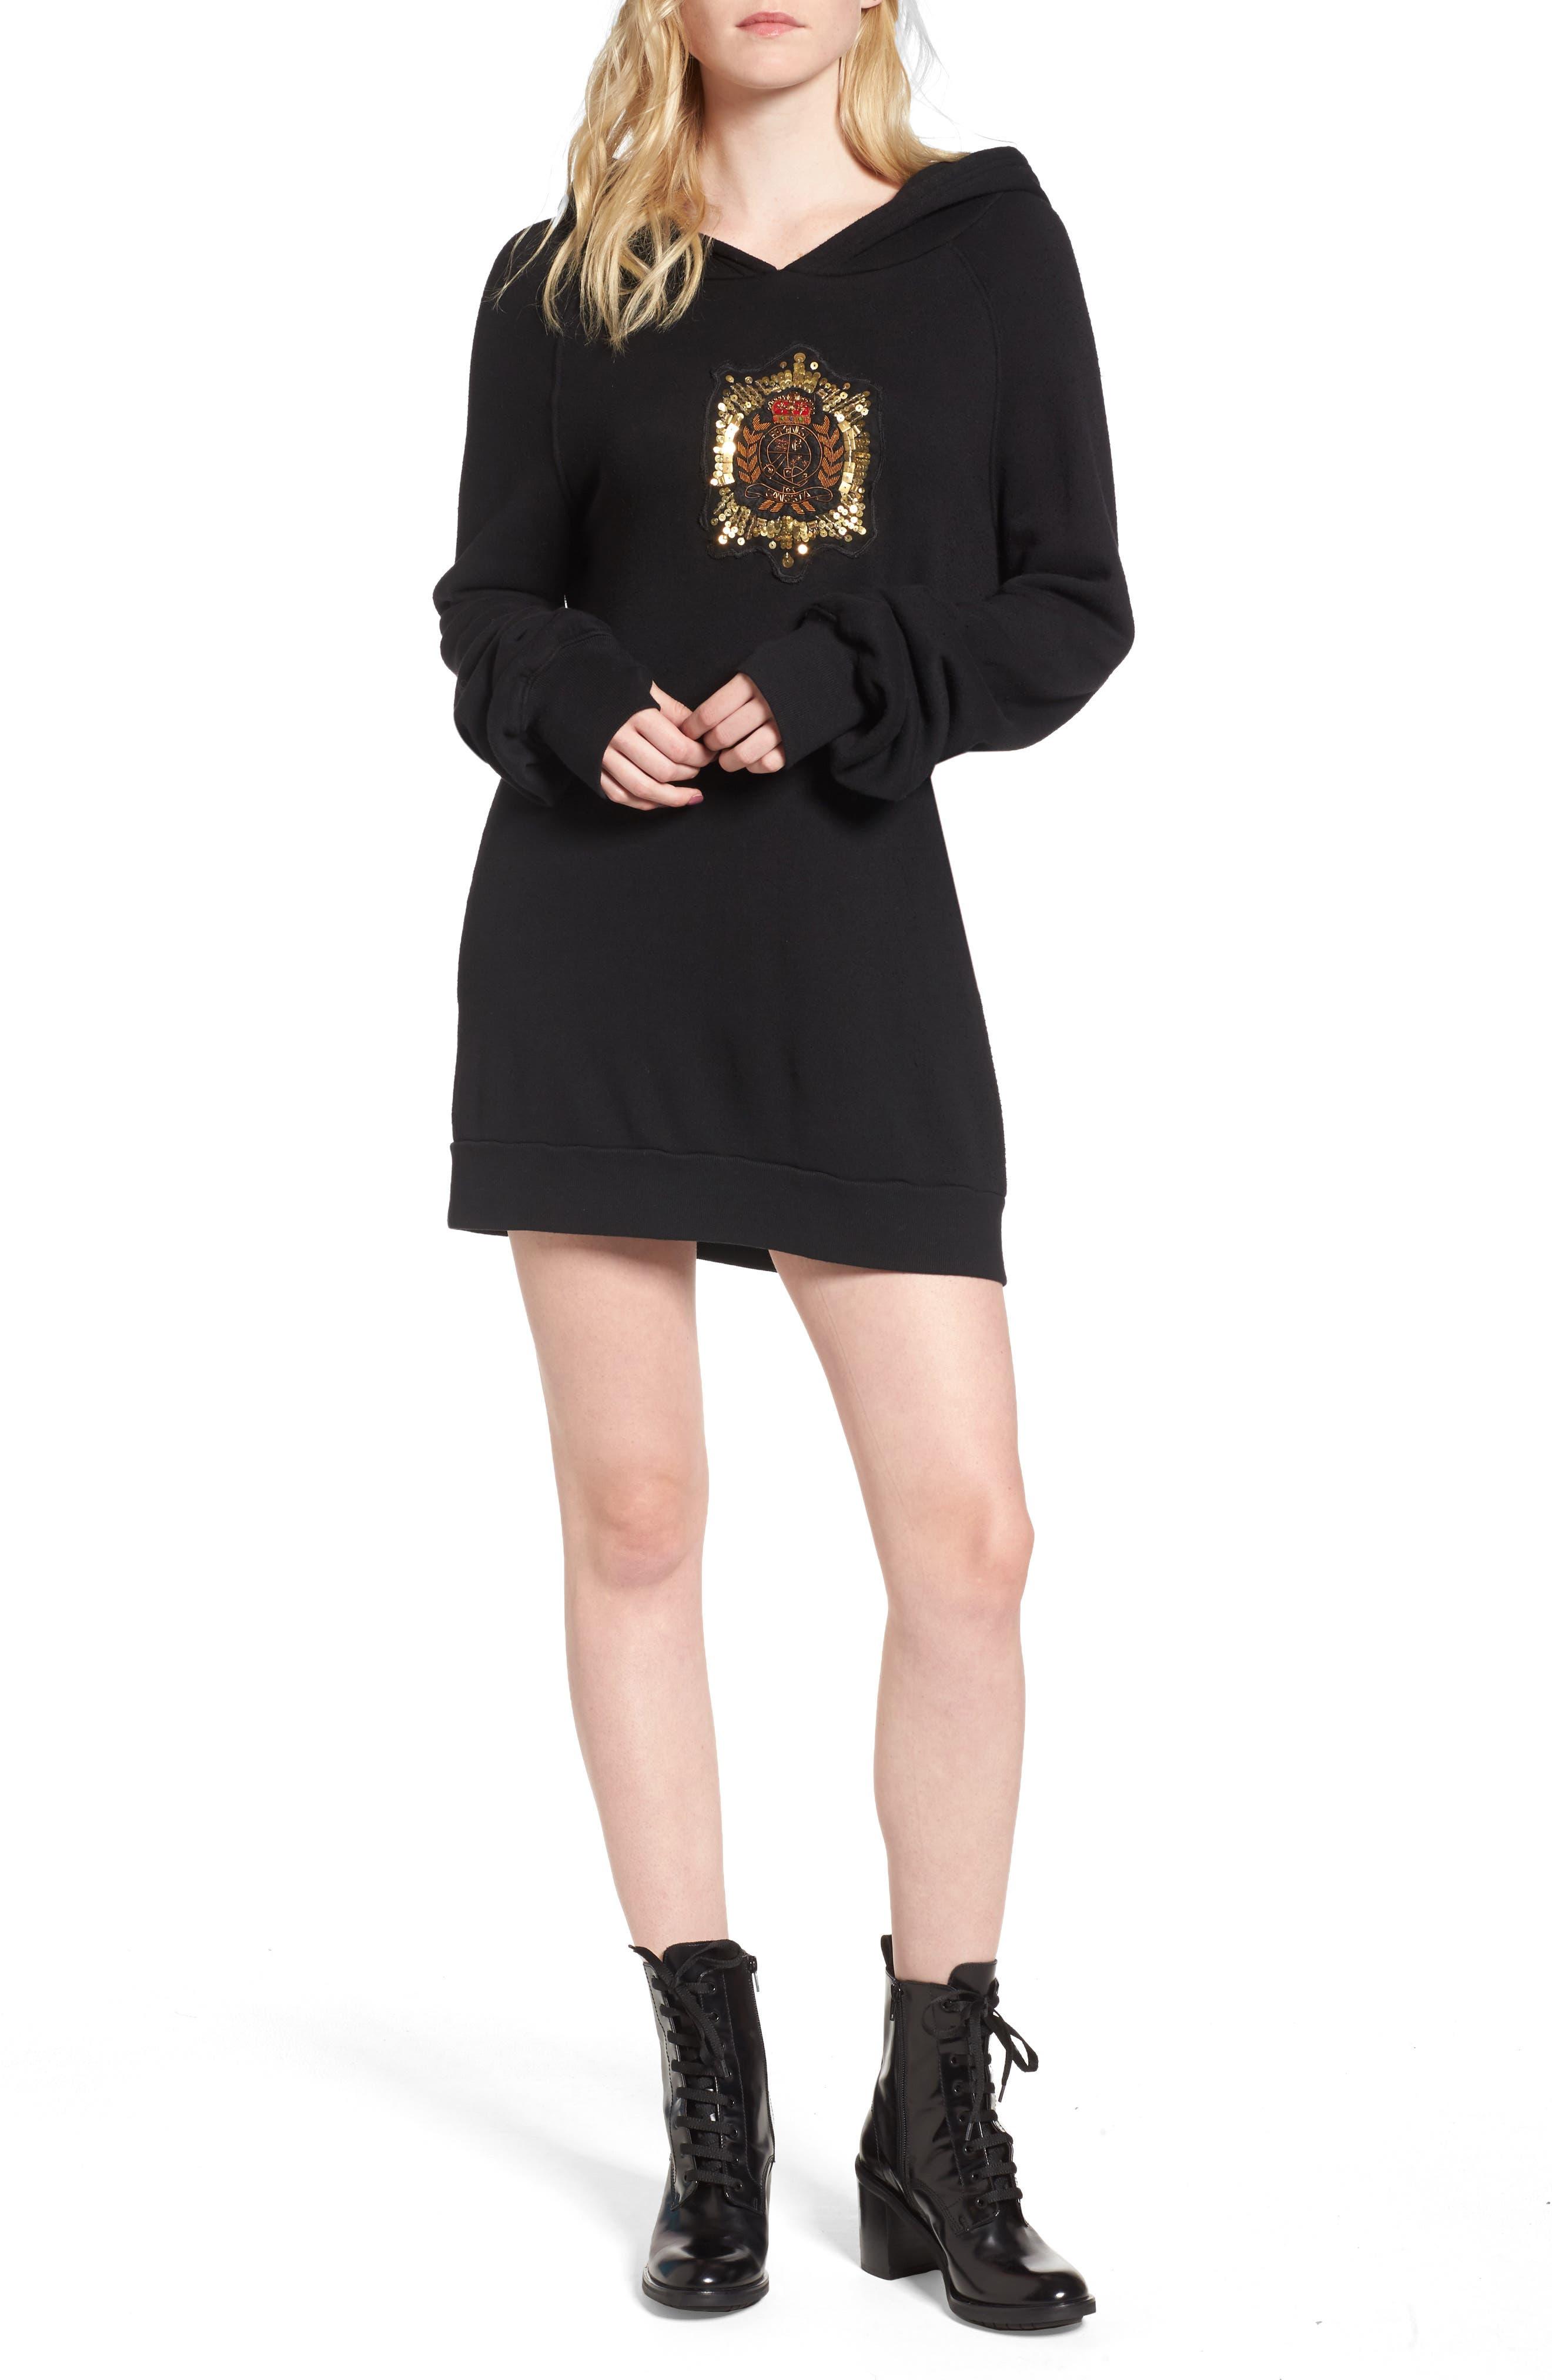 Main Image - Pam & Gela Crest Patch Sweatshirt Dress